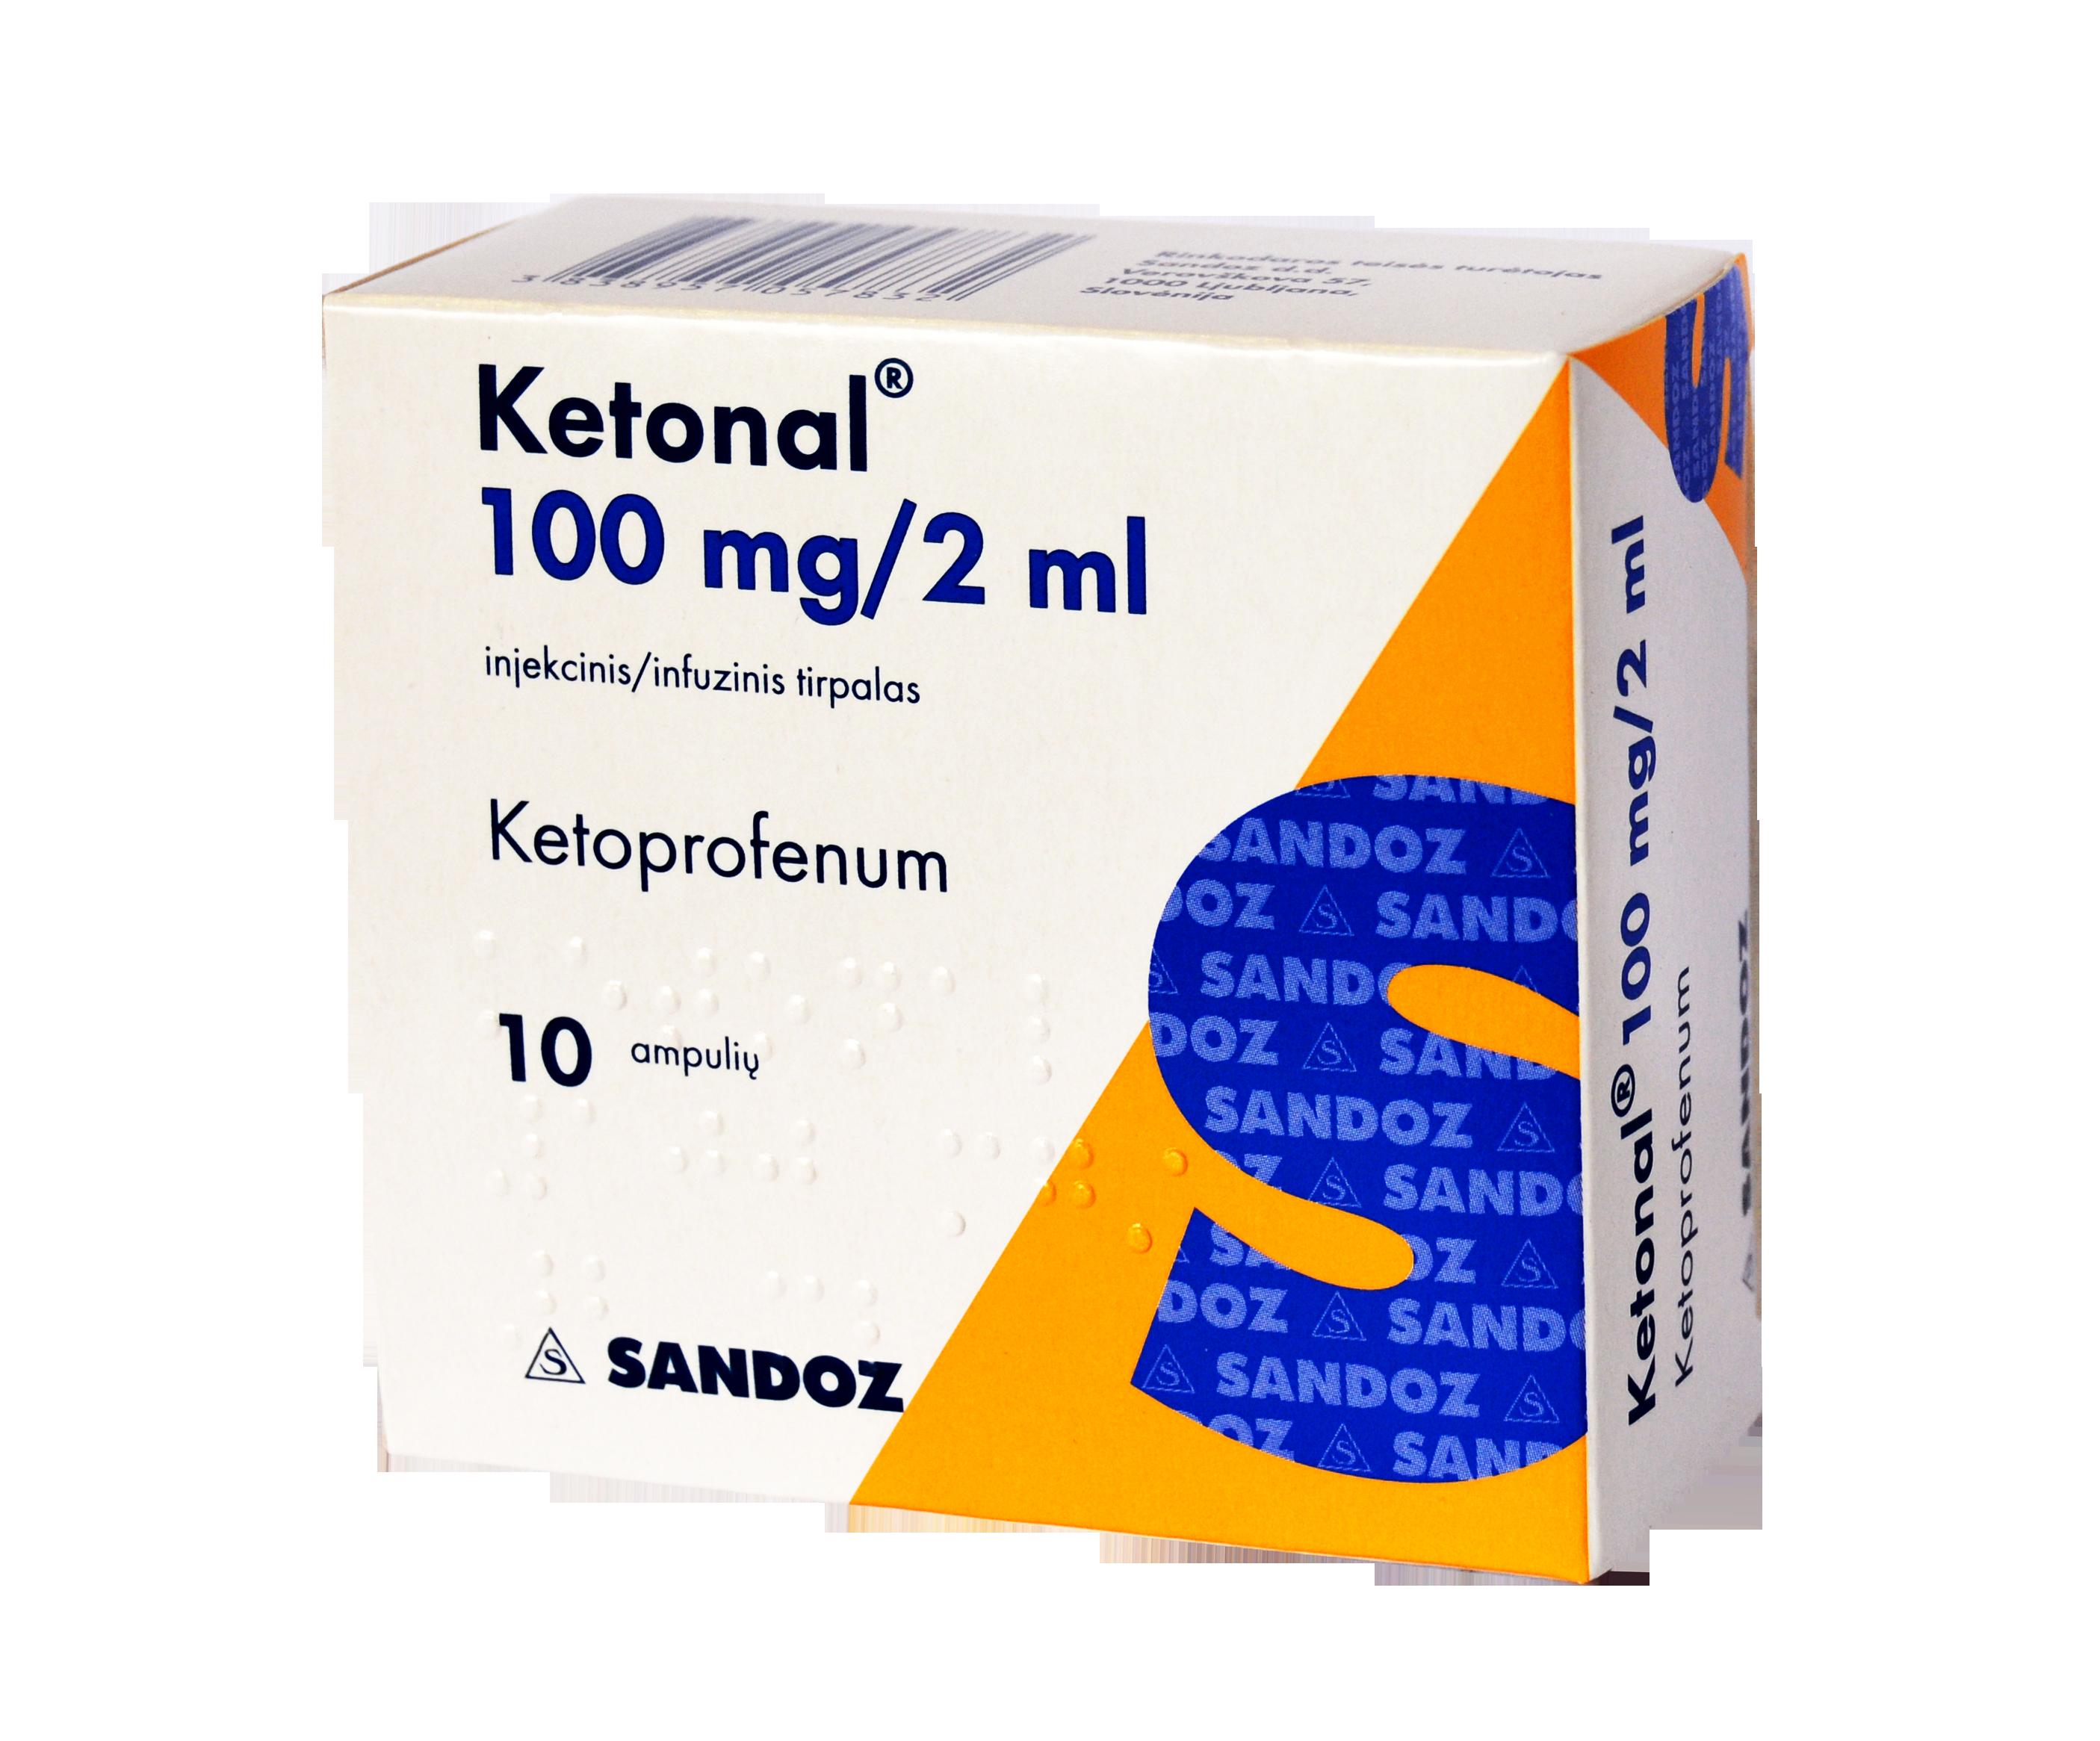 Ketonal mg/2 ml otopina za injekciju/infuziju — Mediately Baza Lijekova